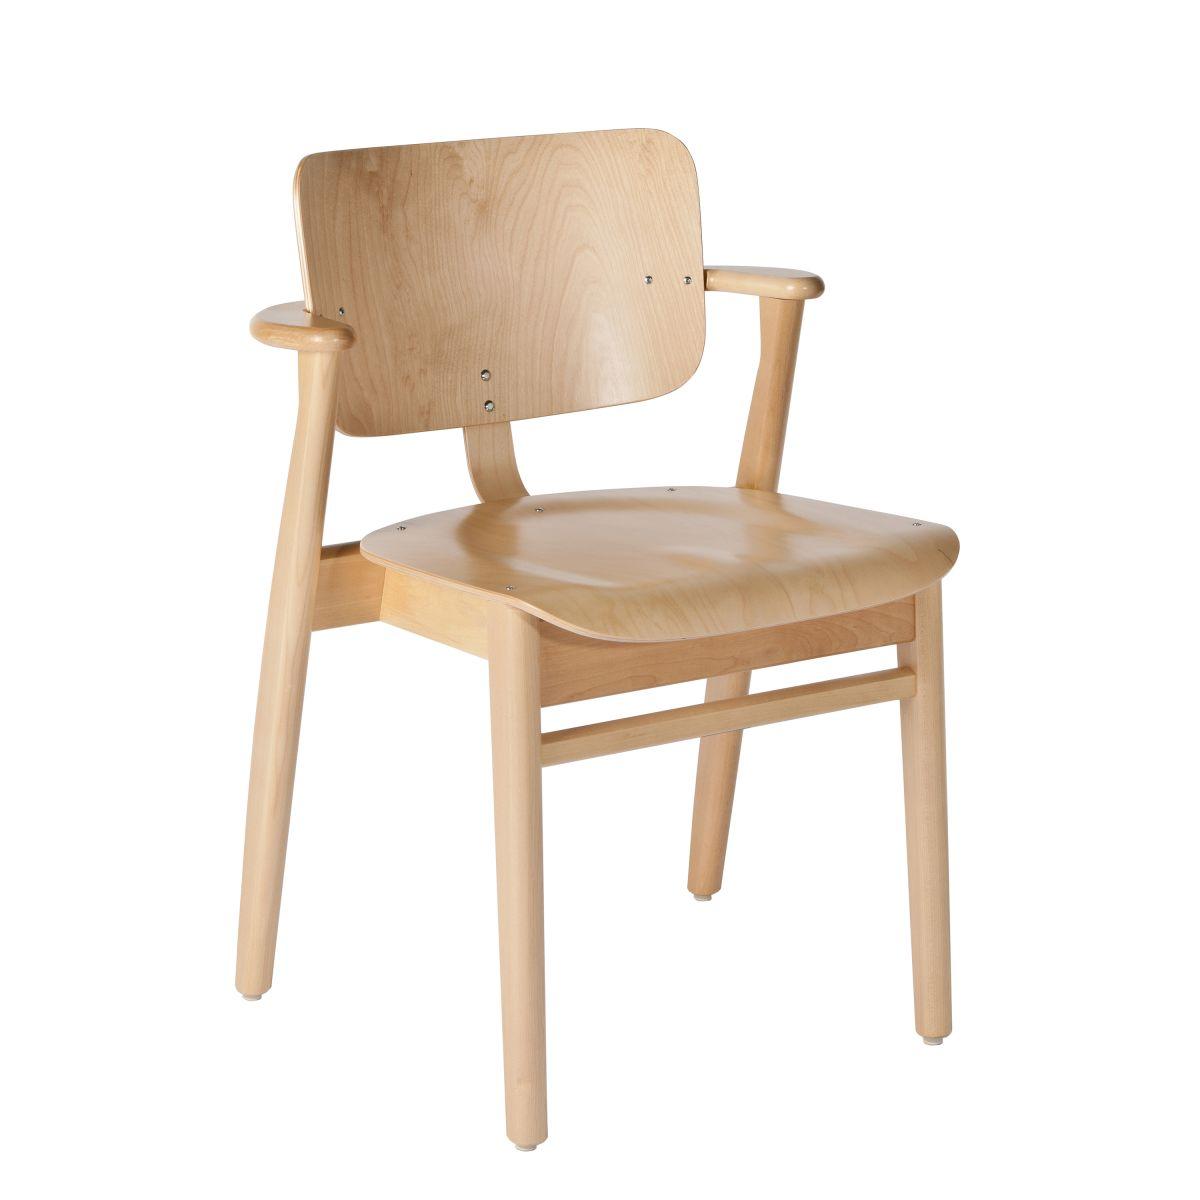 Domus Chair clear lacquer birch